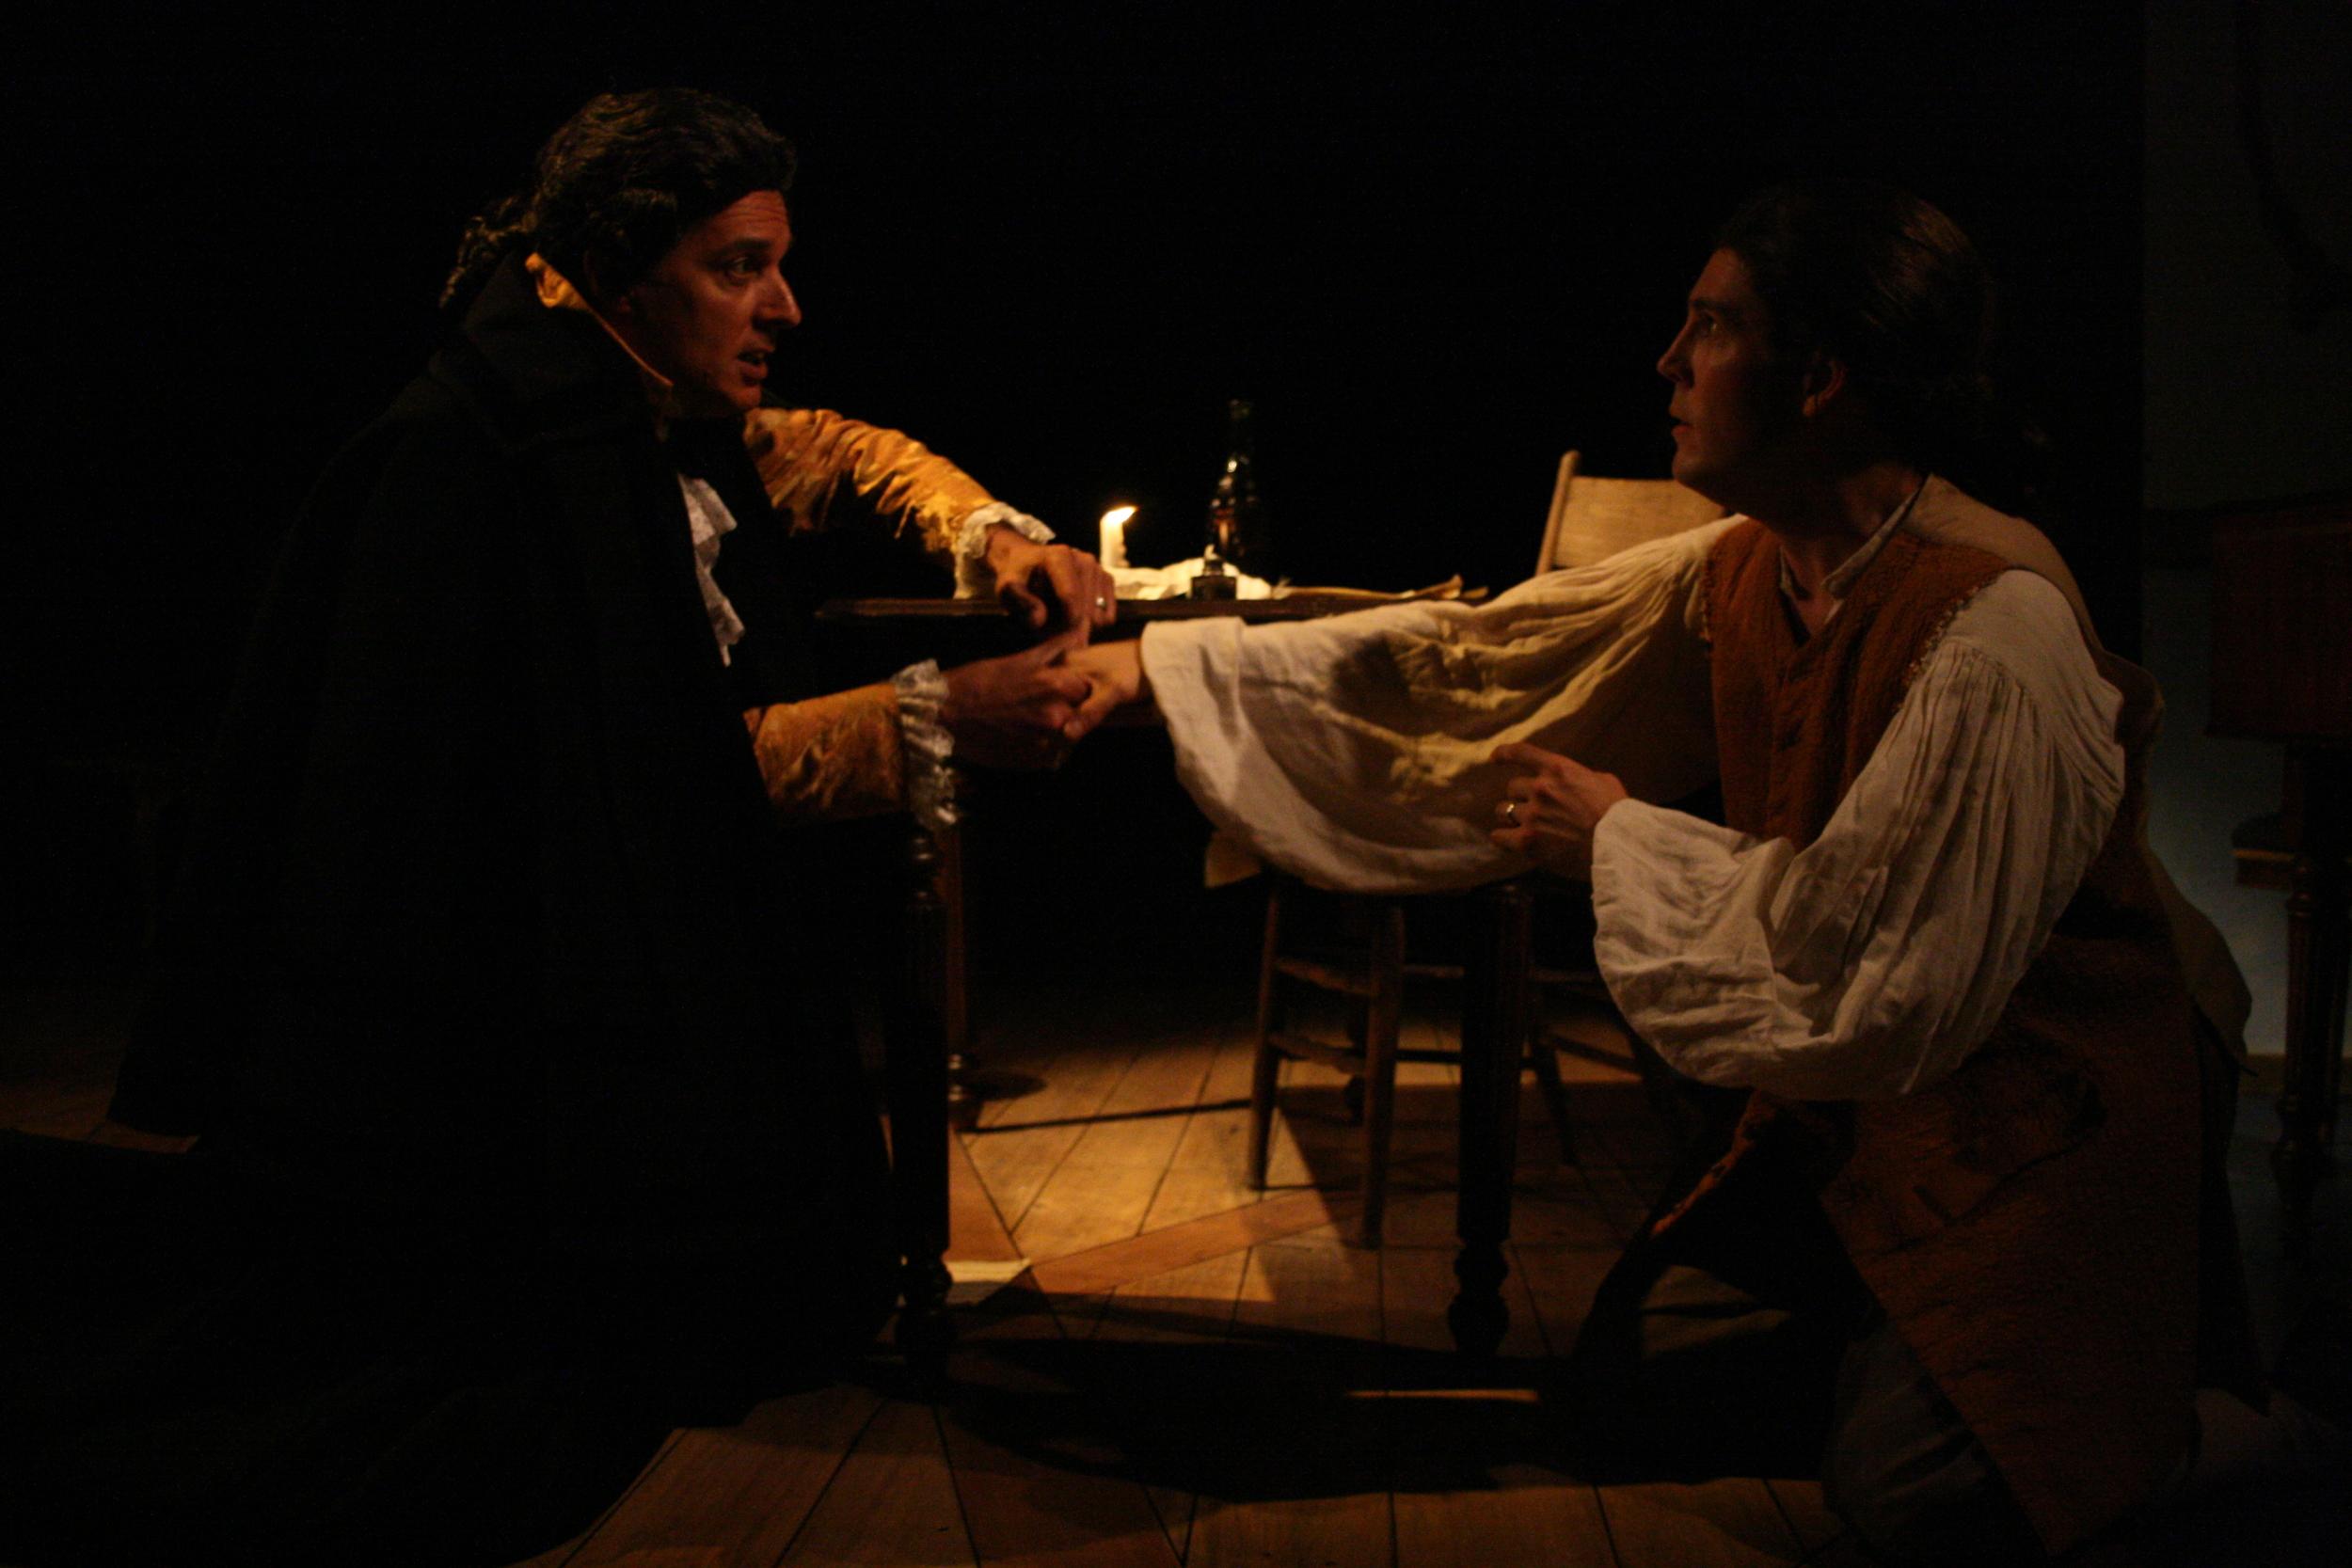 Amadeus - Salieri (Robert Cuccioli),  Mozart (Jordan Coughtry).jpg